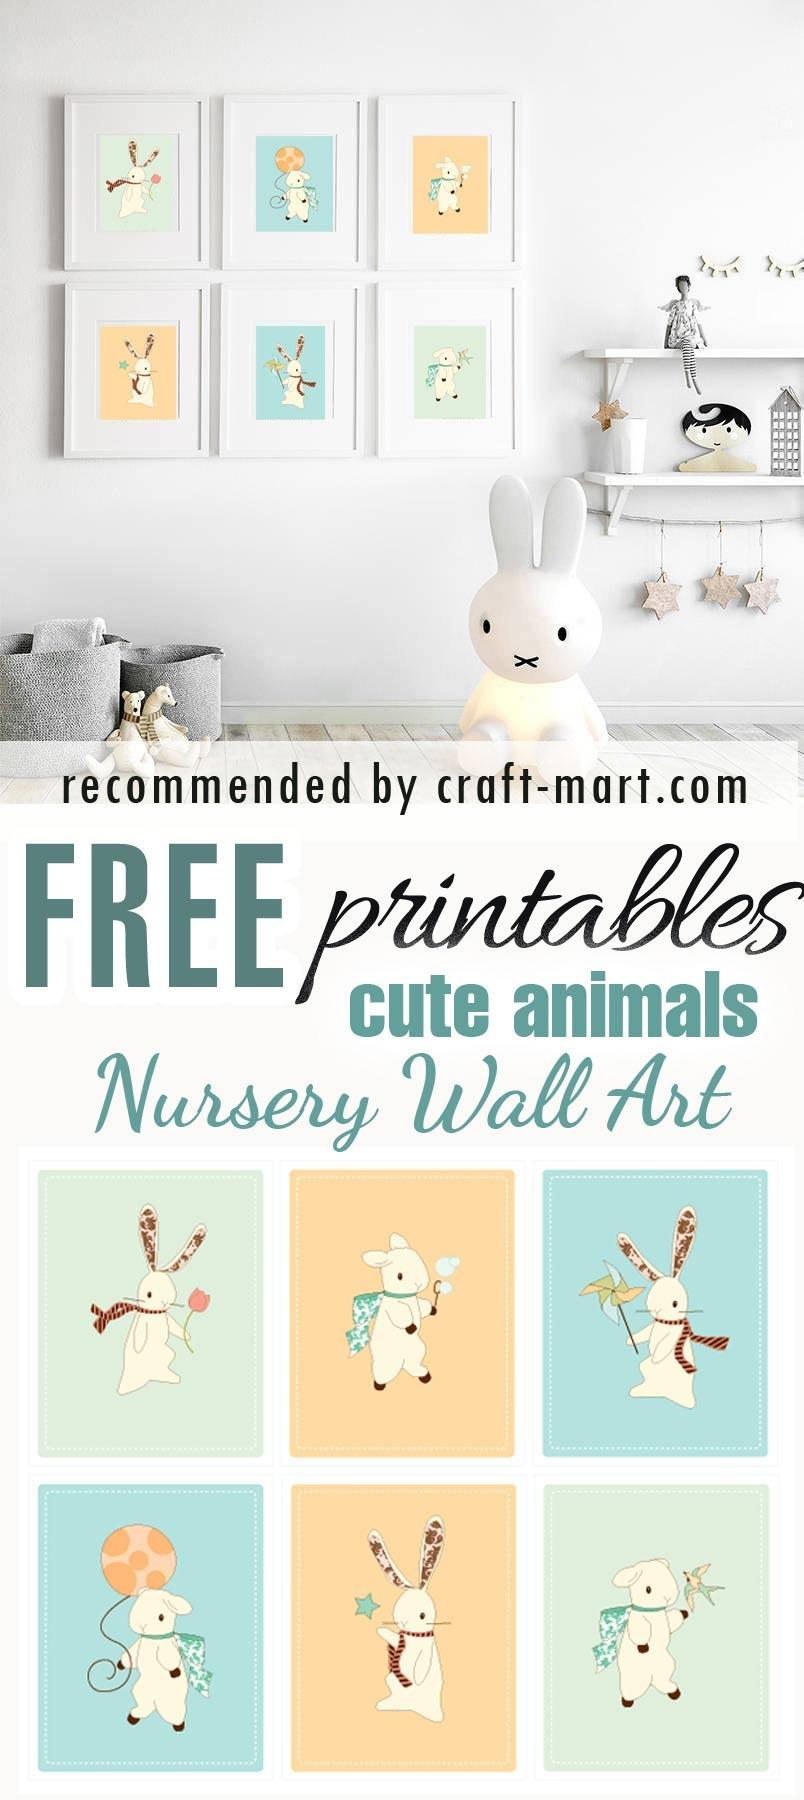 100+ Best Free Nursery Printables And Wall Art - Craft-Mart - Free Nursery Printables Boy